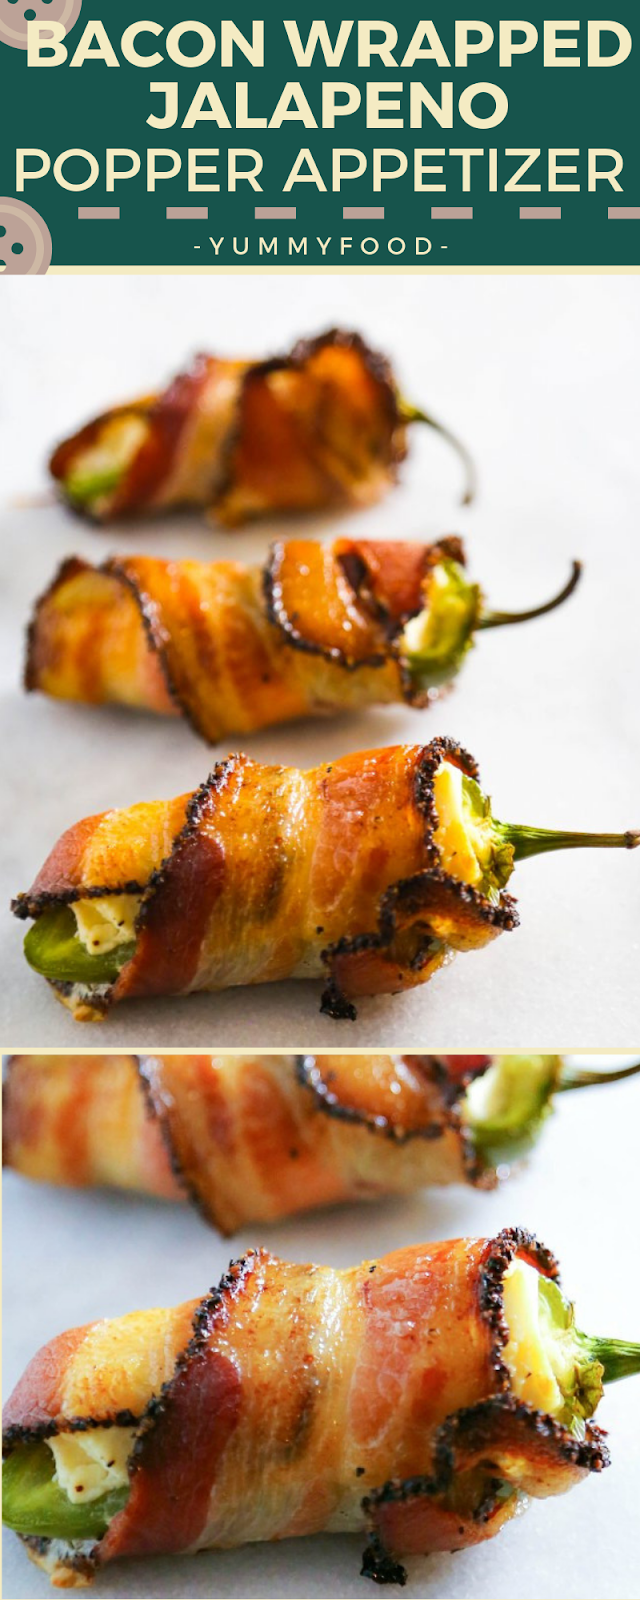 Bacon Wrapped Jalapeno Pорреr Aрреtіzеr Recipe